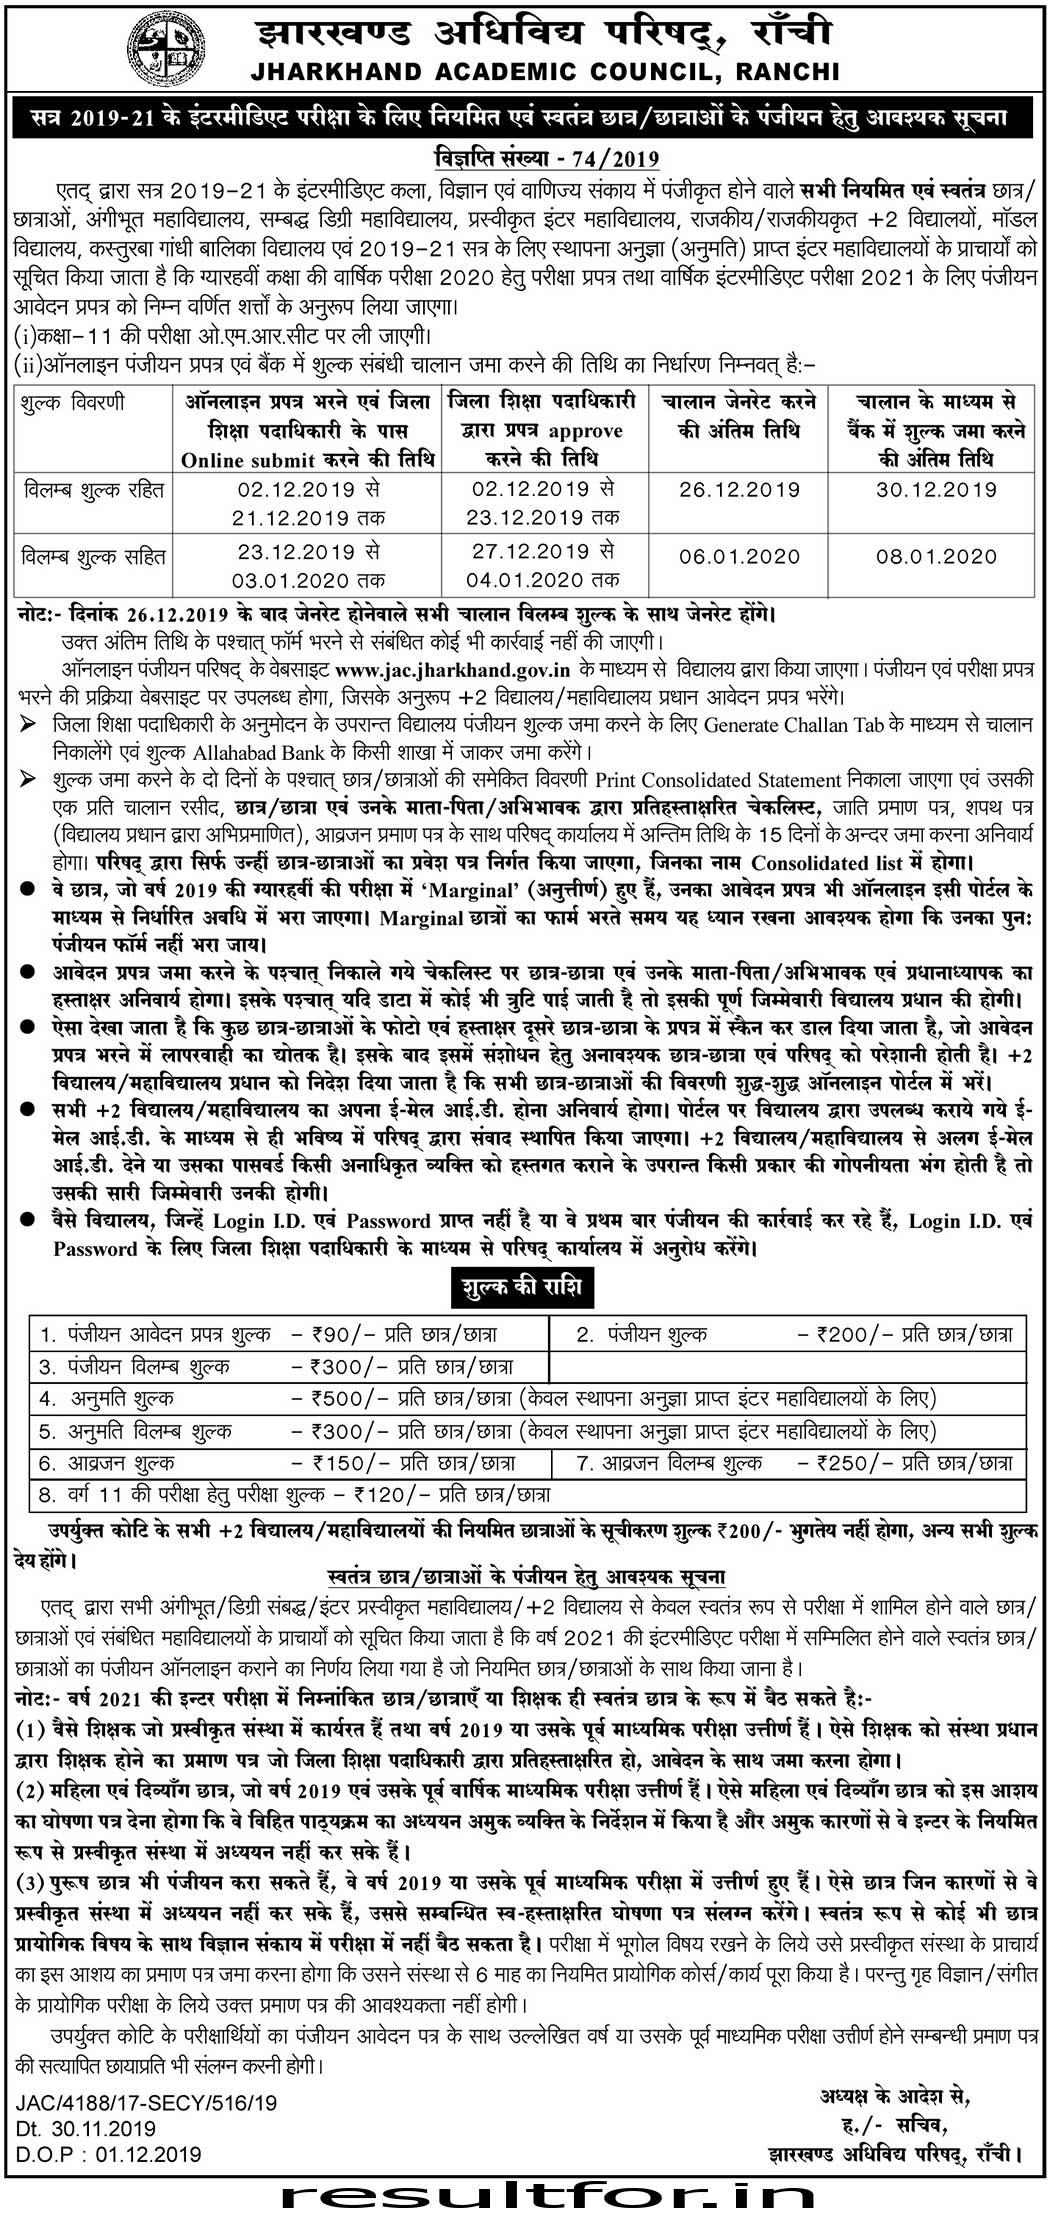 JAC-Inter-Registration-cum-11th-Exam-form-fill-up-update 2020